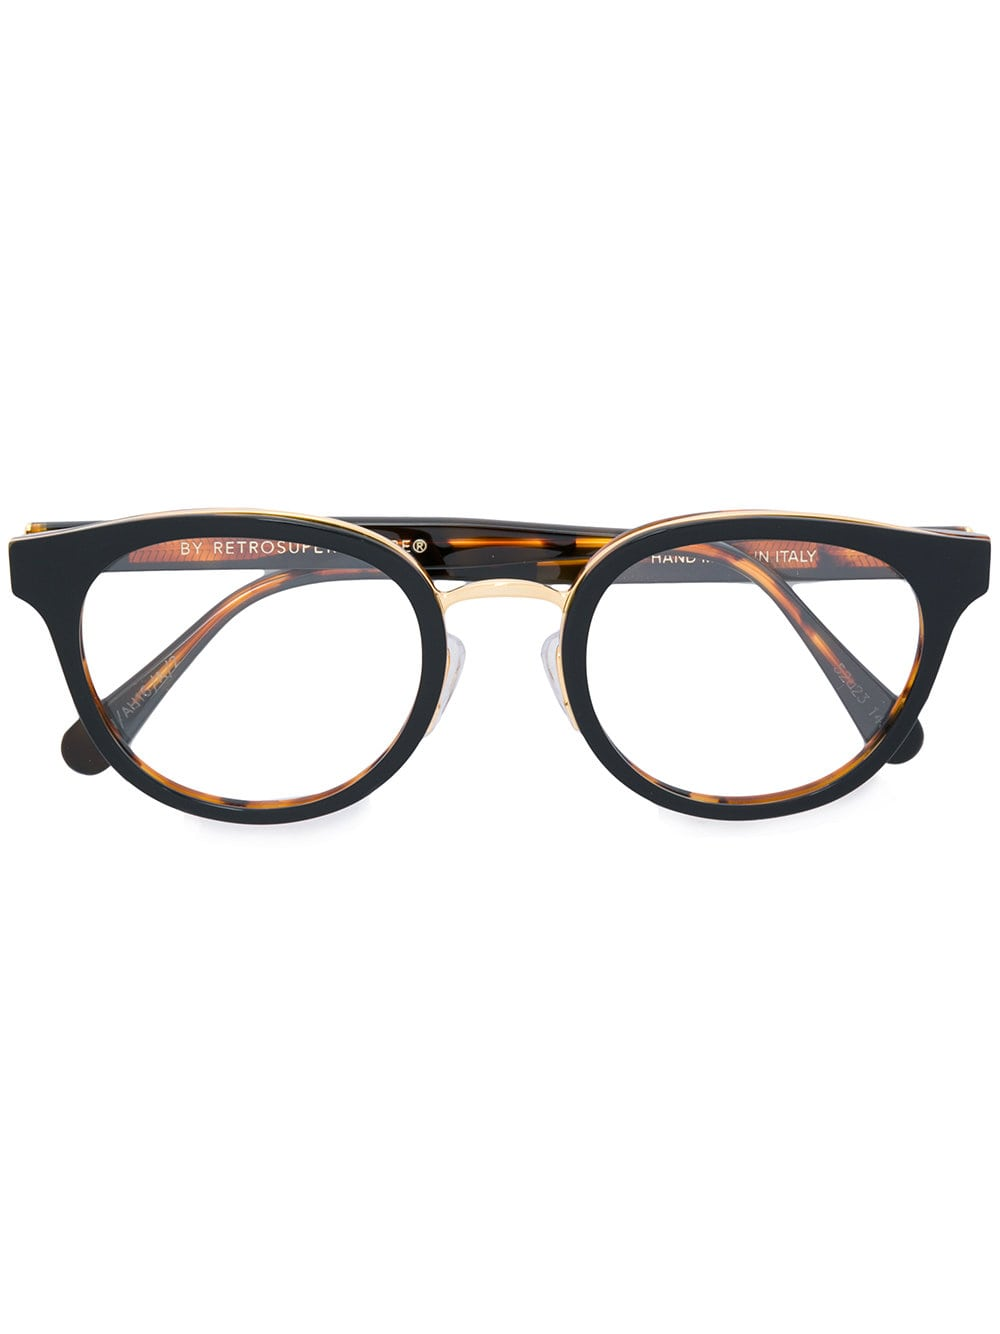 RetroSuperFuture Eyewear Farfetch Sale